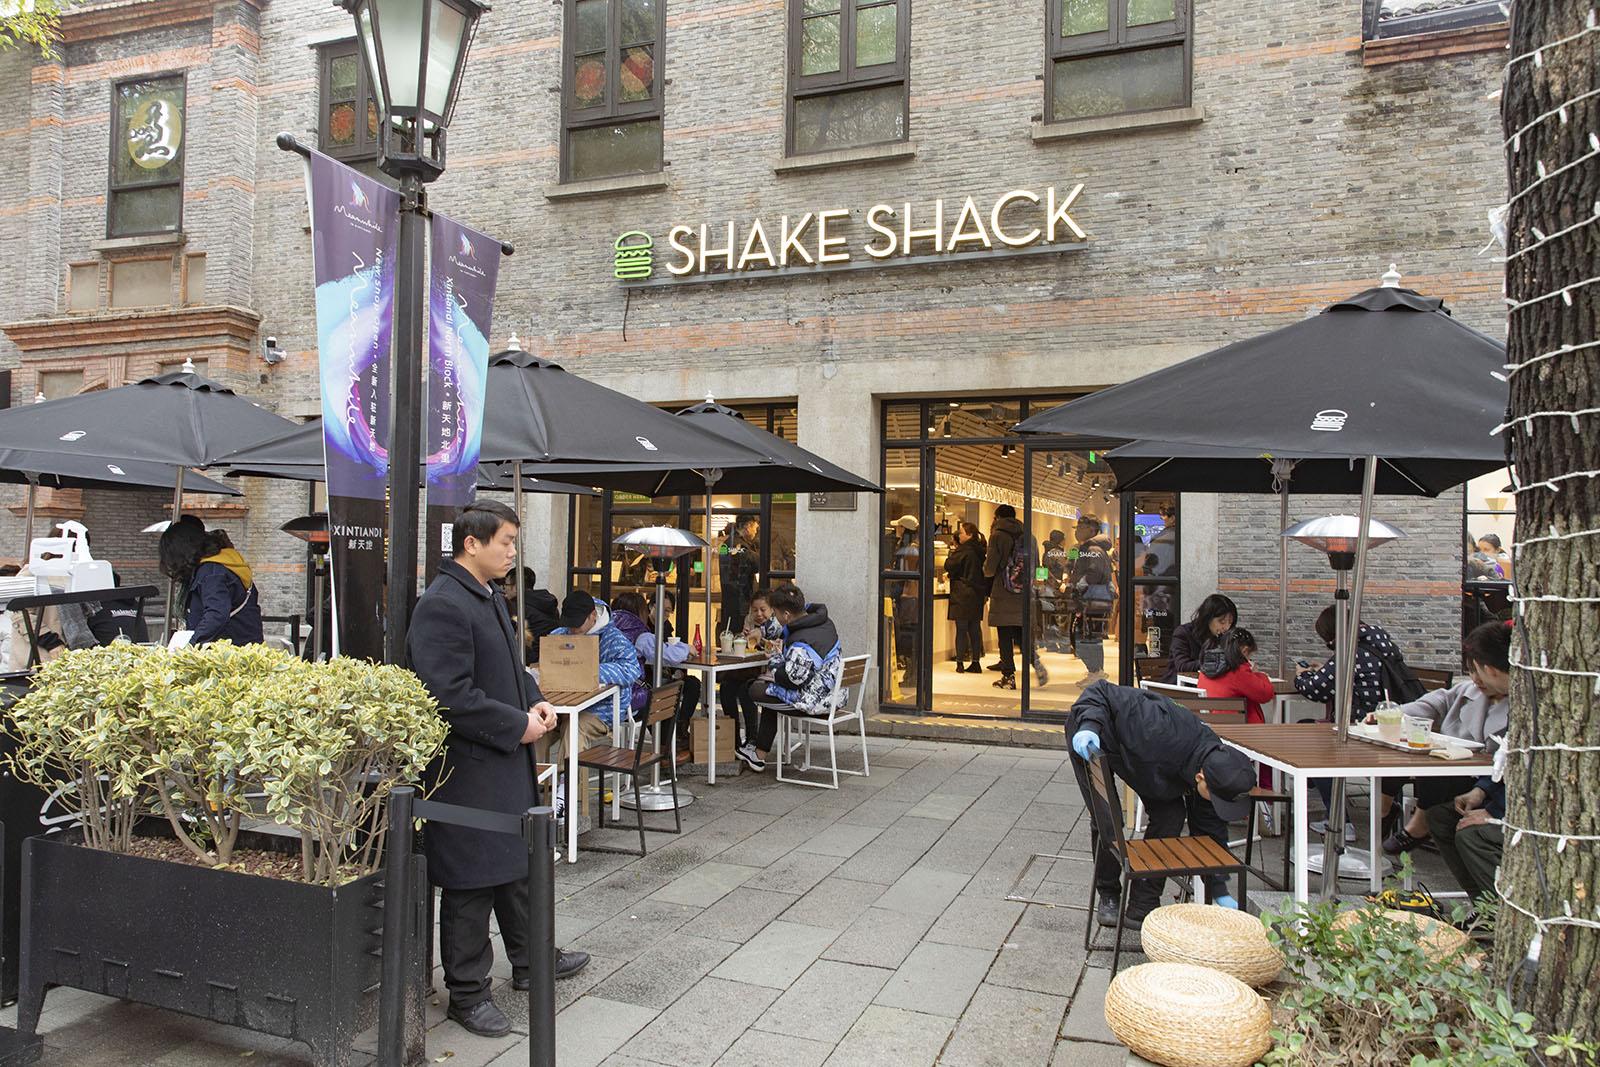 Shake Shack (Xintiandi) Shanghai